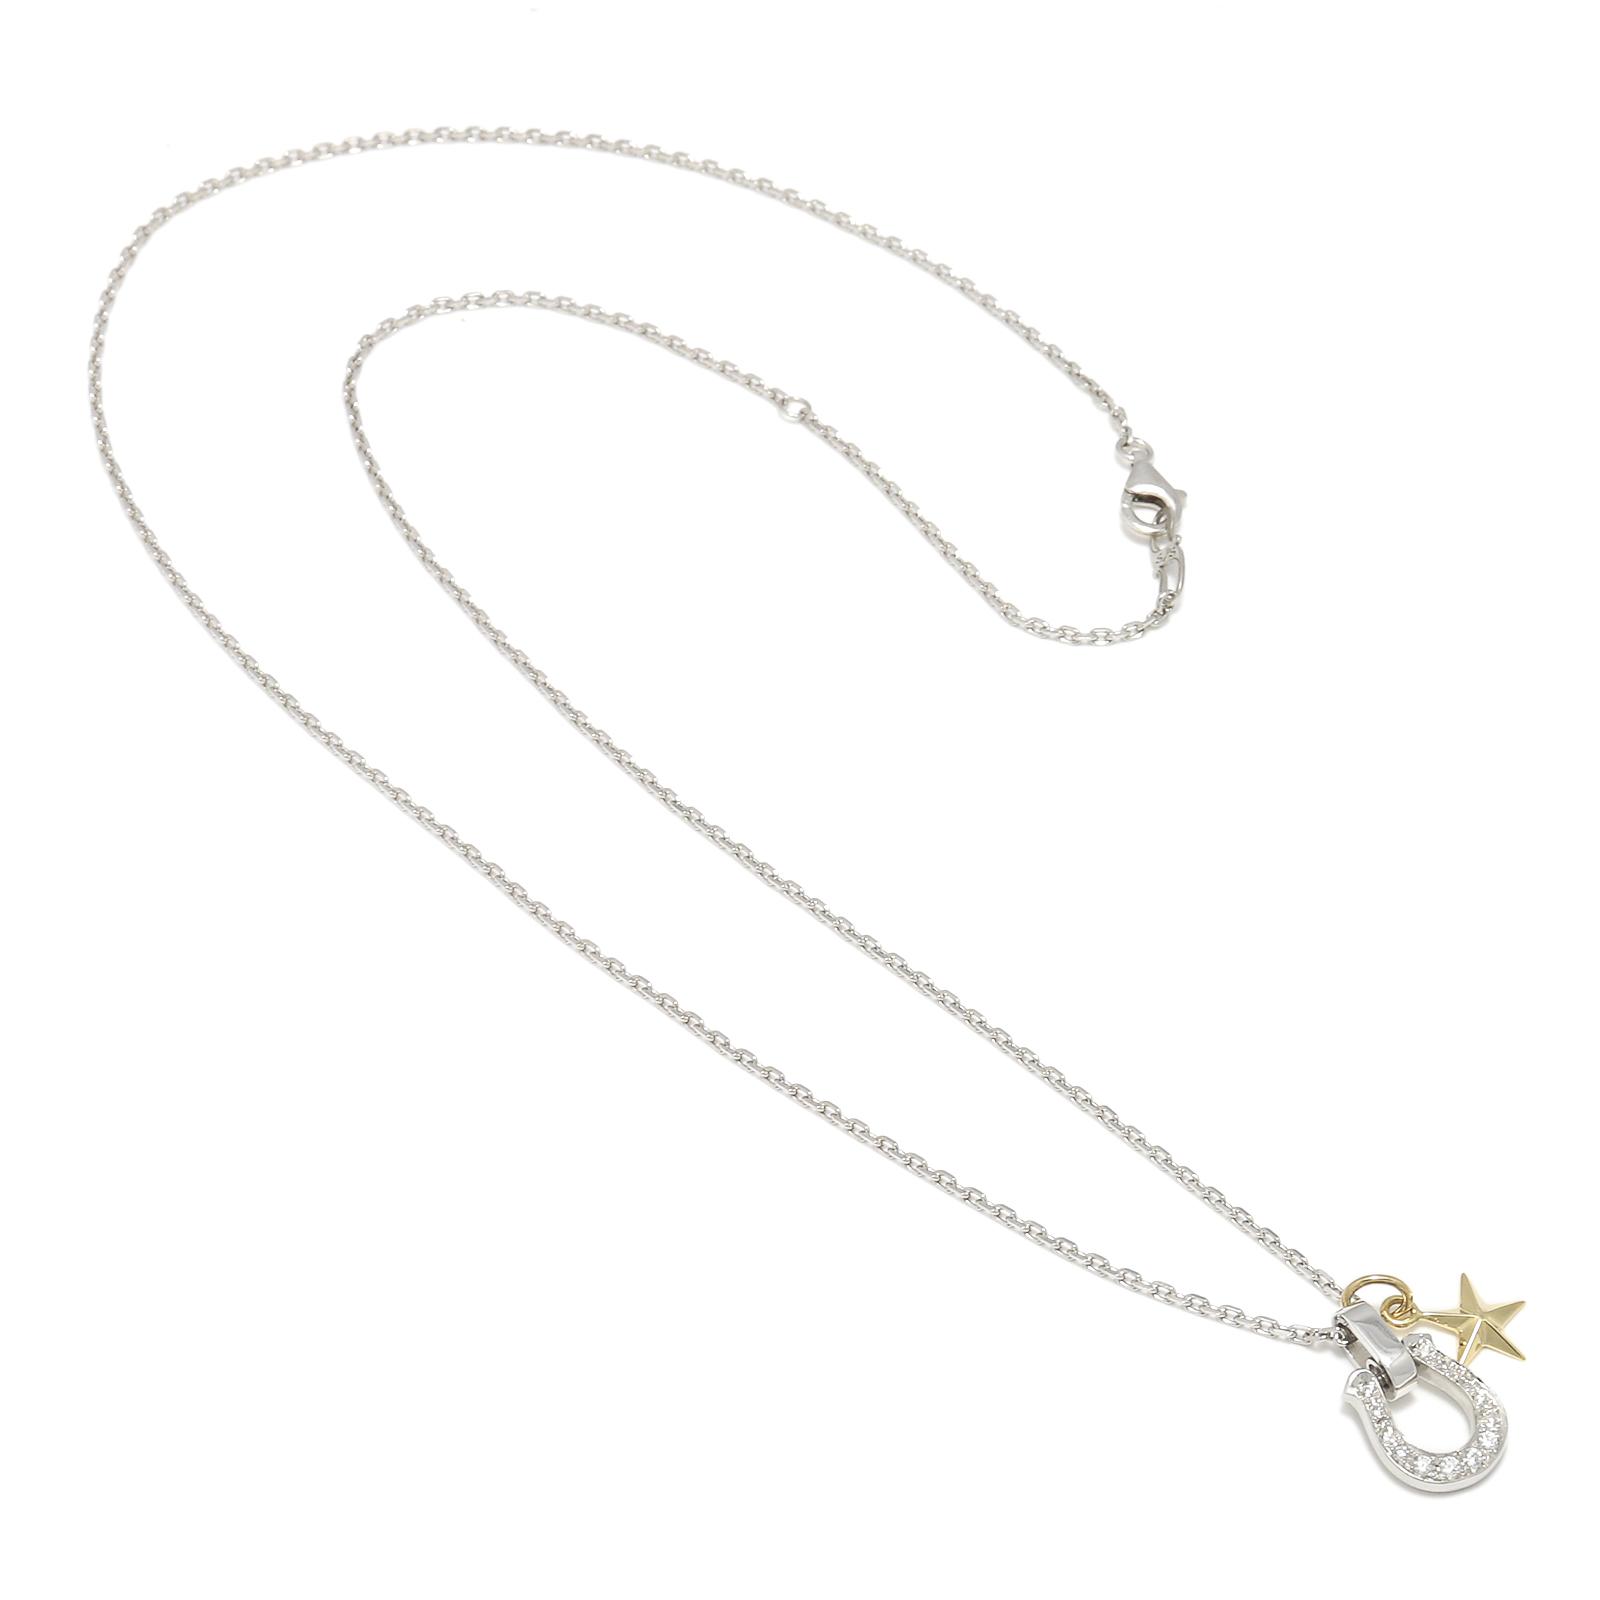 Horseshoe Amulet - Silver w/CZ + Small Star Charm - K18Yellow  Gold Set Necklace